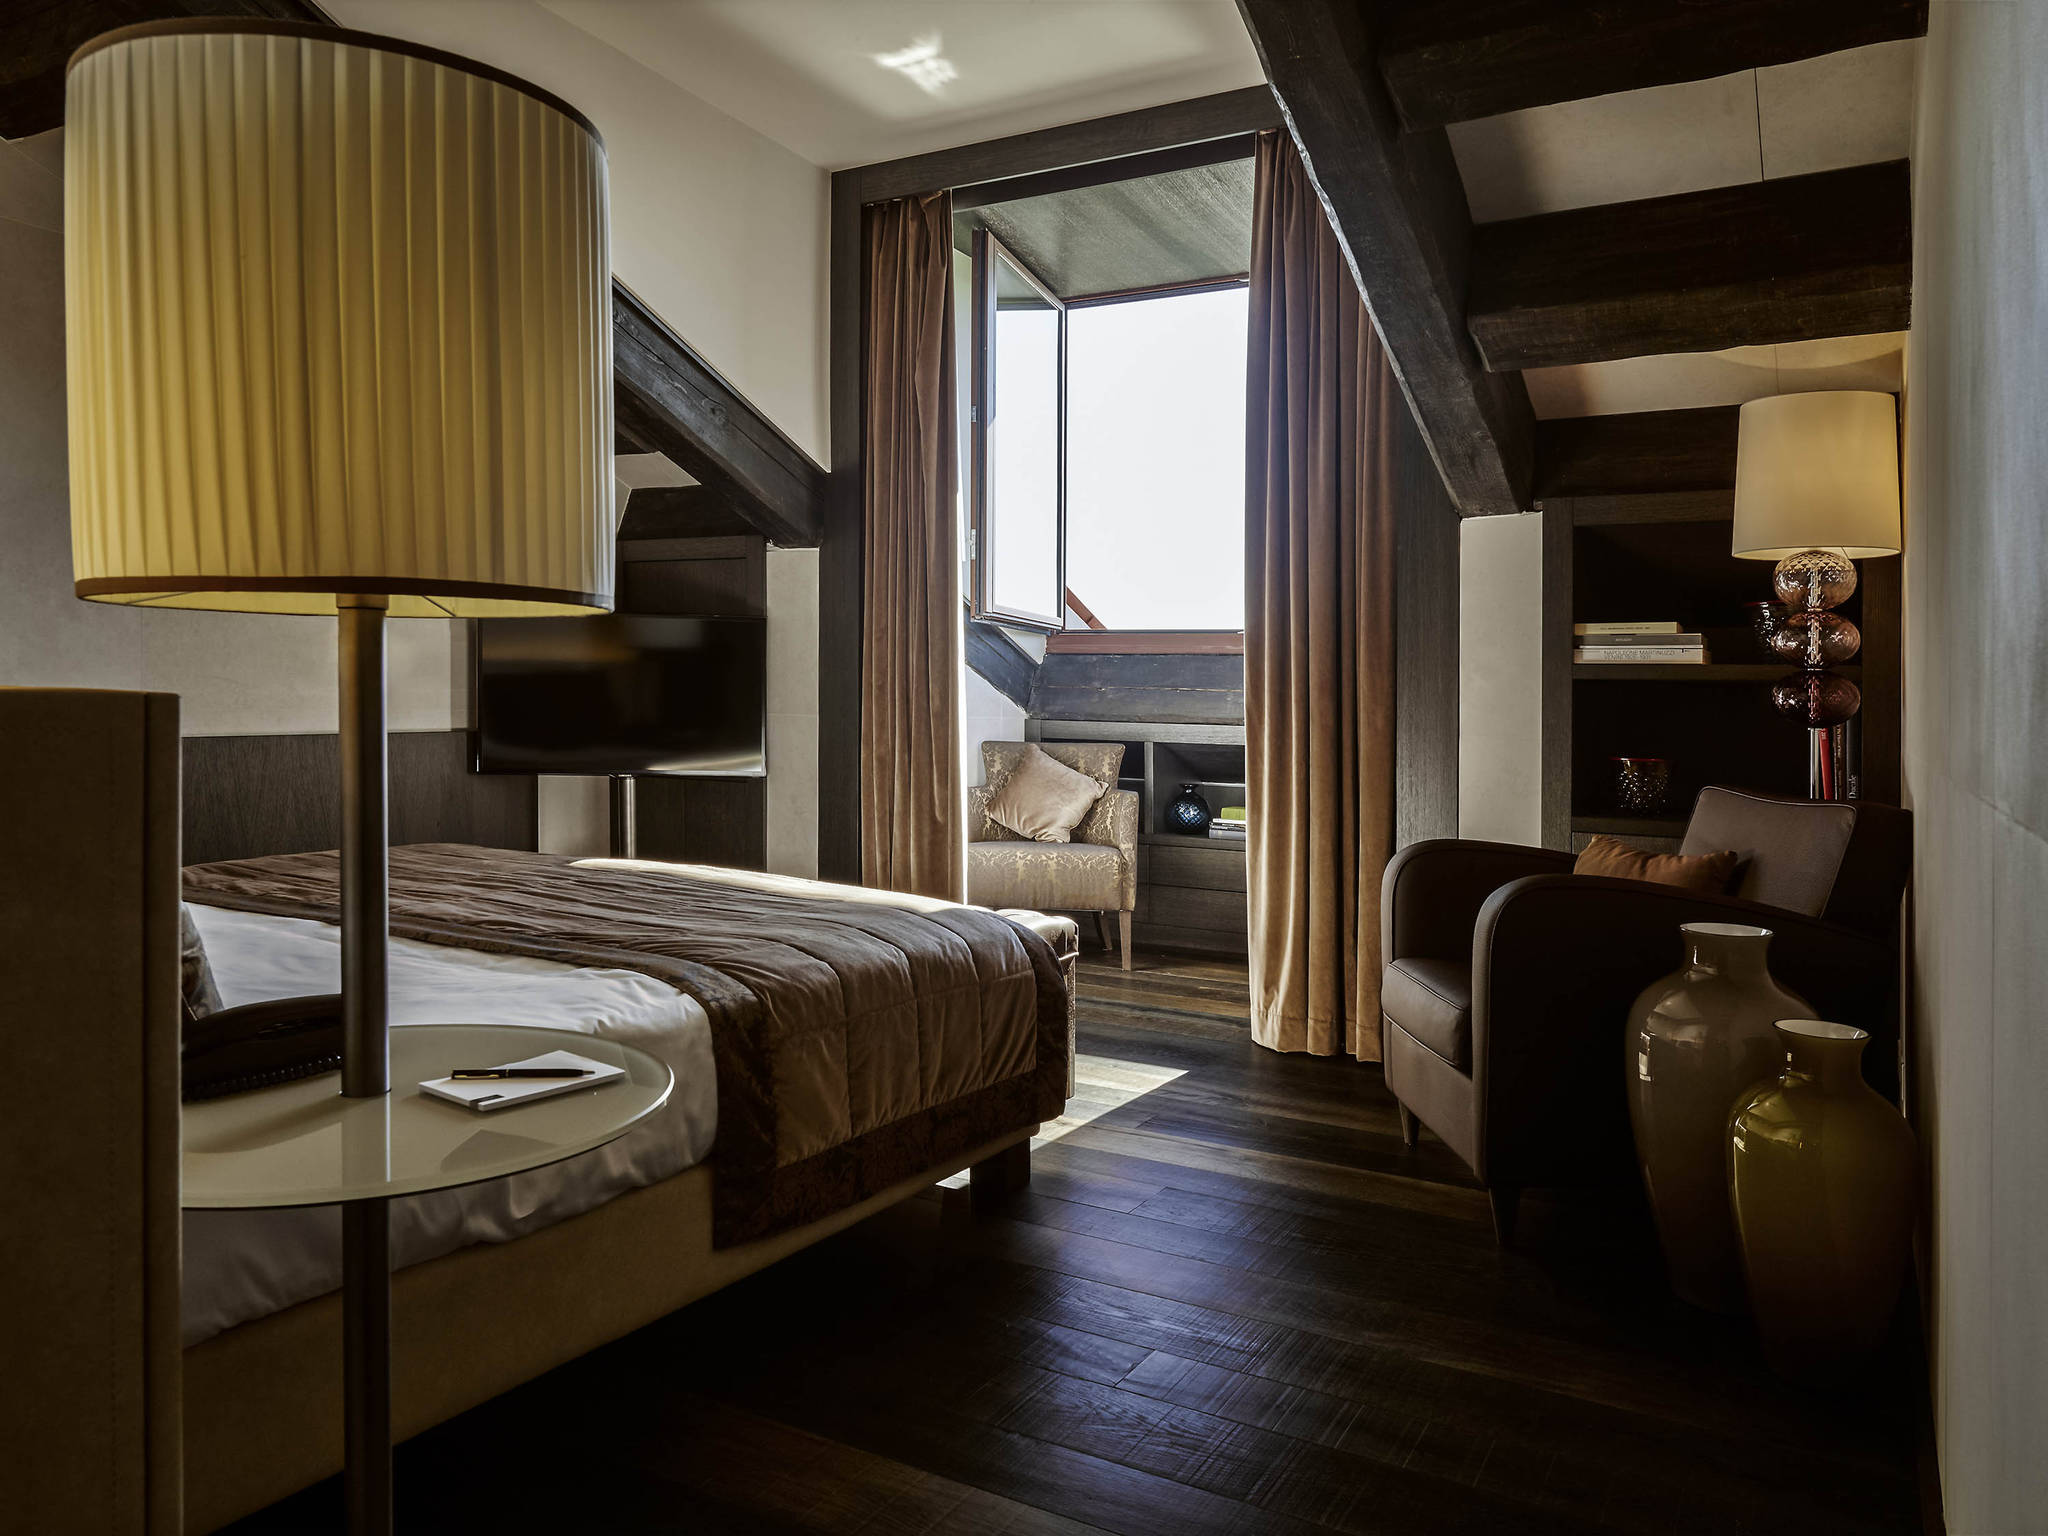 Hotel in Venedig - LaGare Hotel Venezia - MGallery by Sofitel